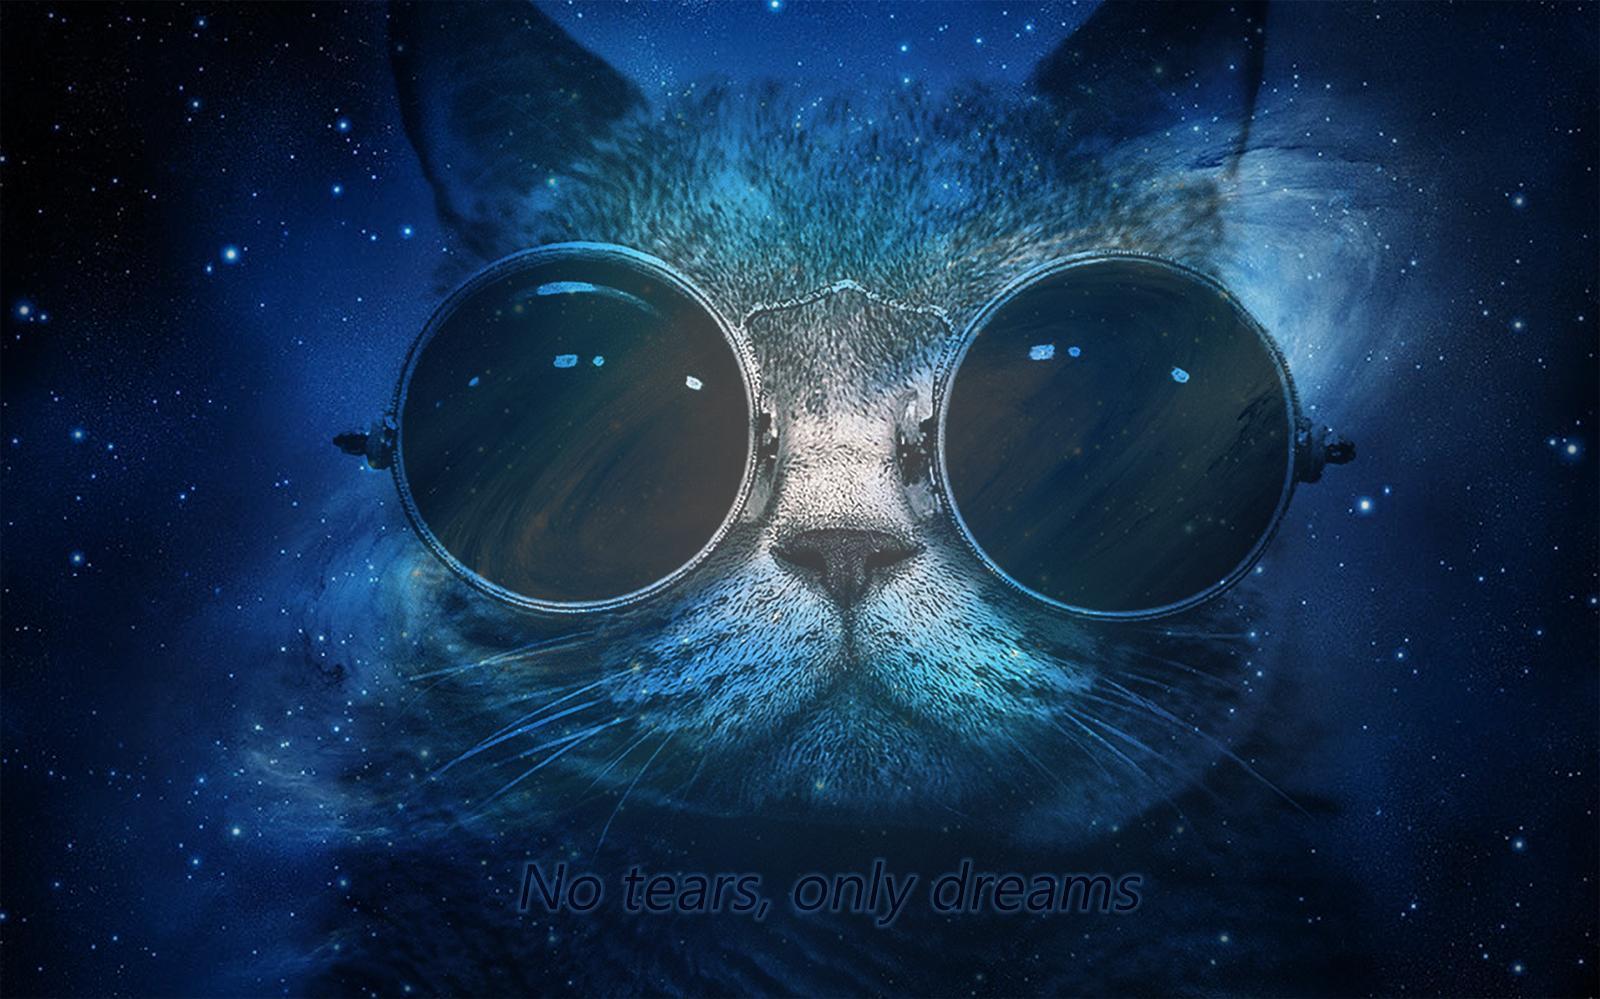 42 cat in space wallpaper on wallpapersafari - Deep blue space wallpaper ...